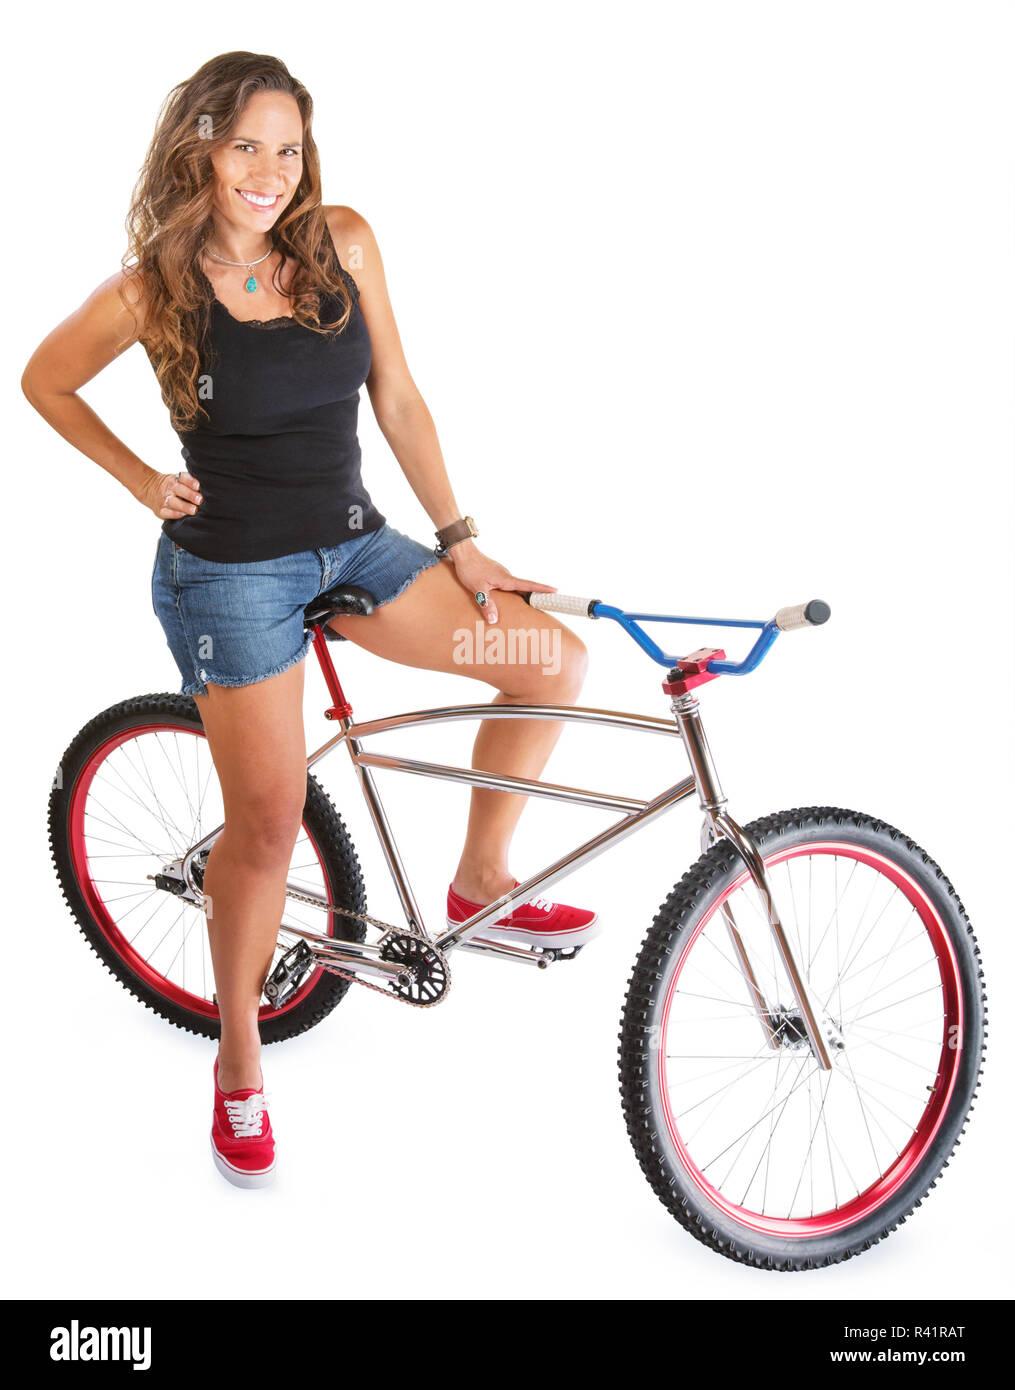 Smiling Woman on Mountain Bike - Stock Image